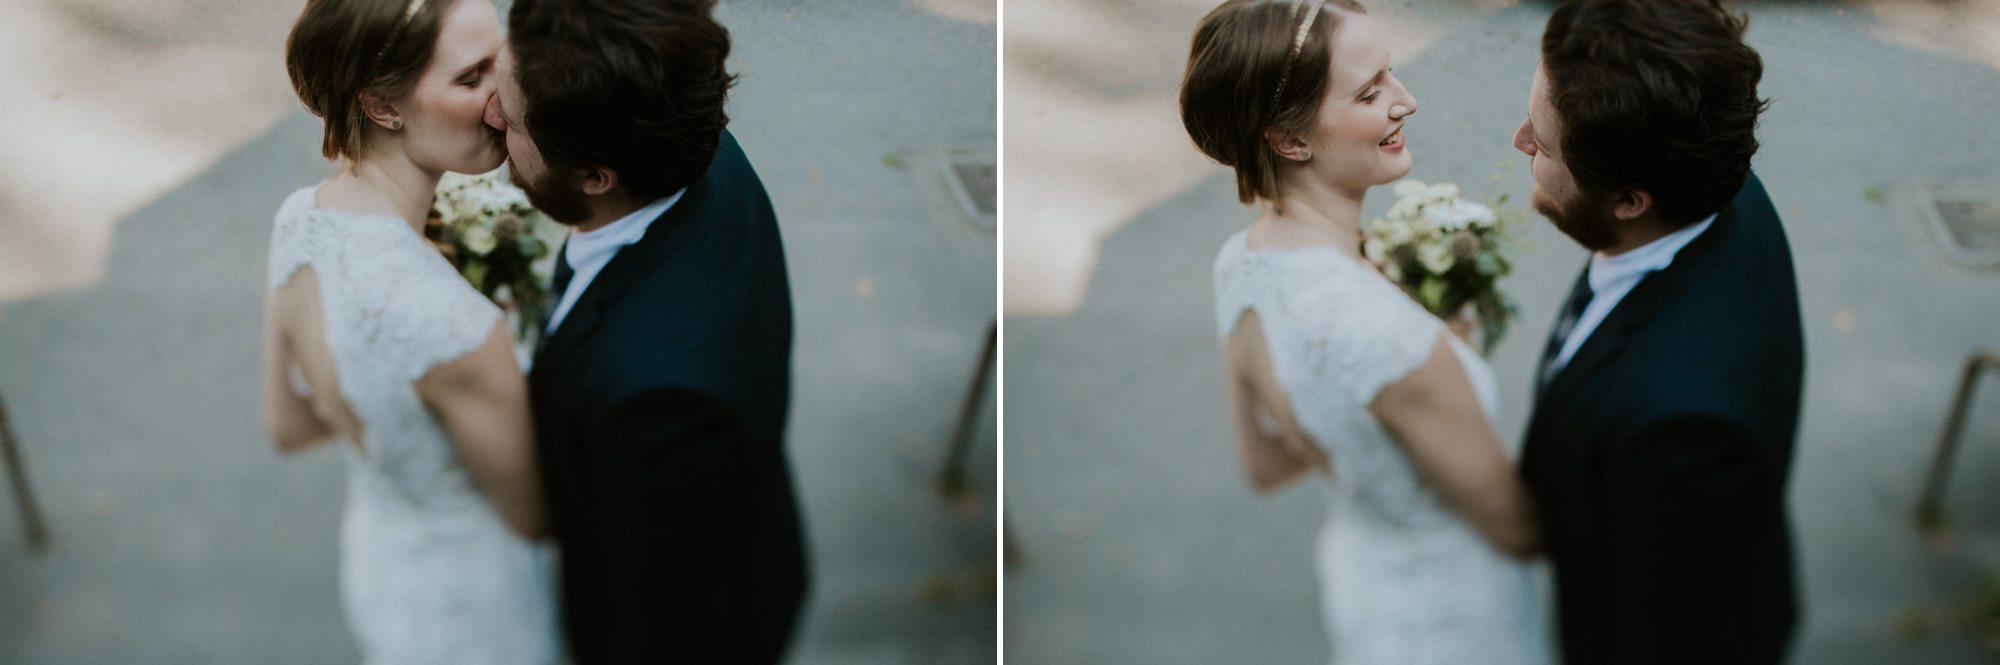 849-abbotsford-wedding-photographer